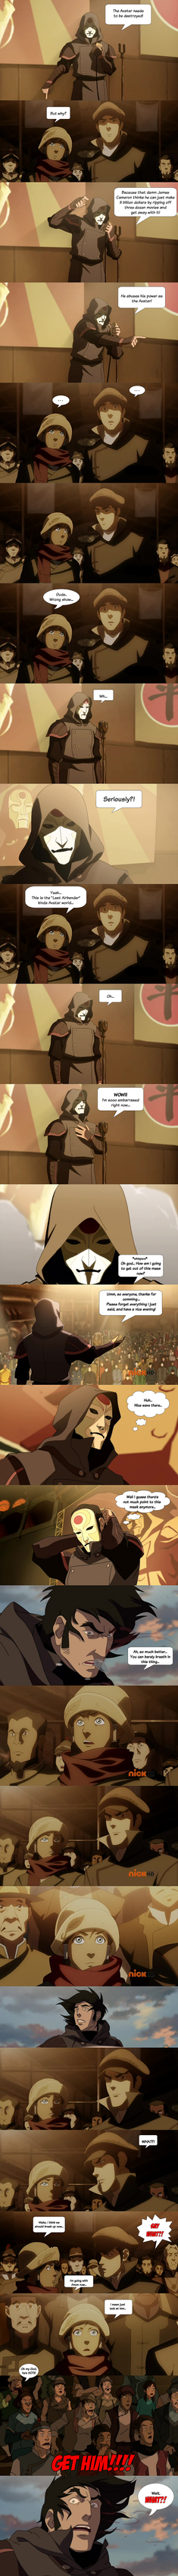 Legend of Korra - It was all a misunderstanding... by yourparodies